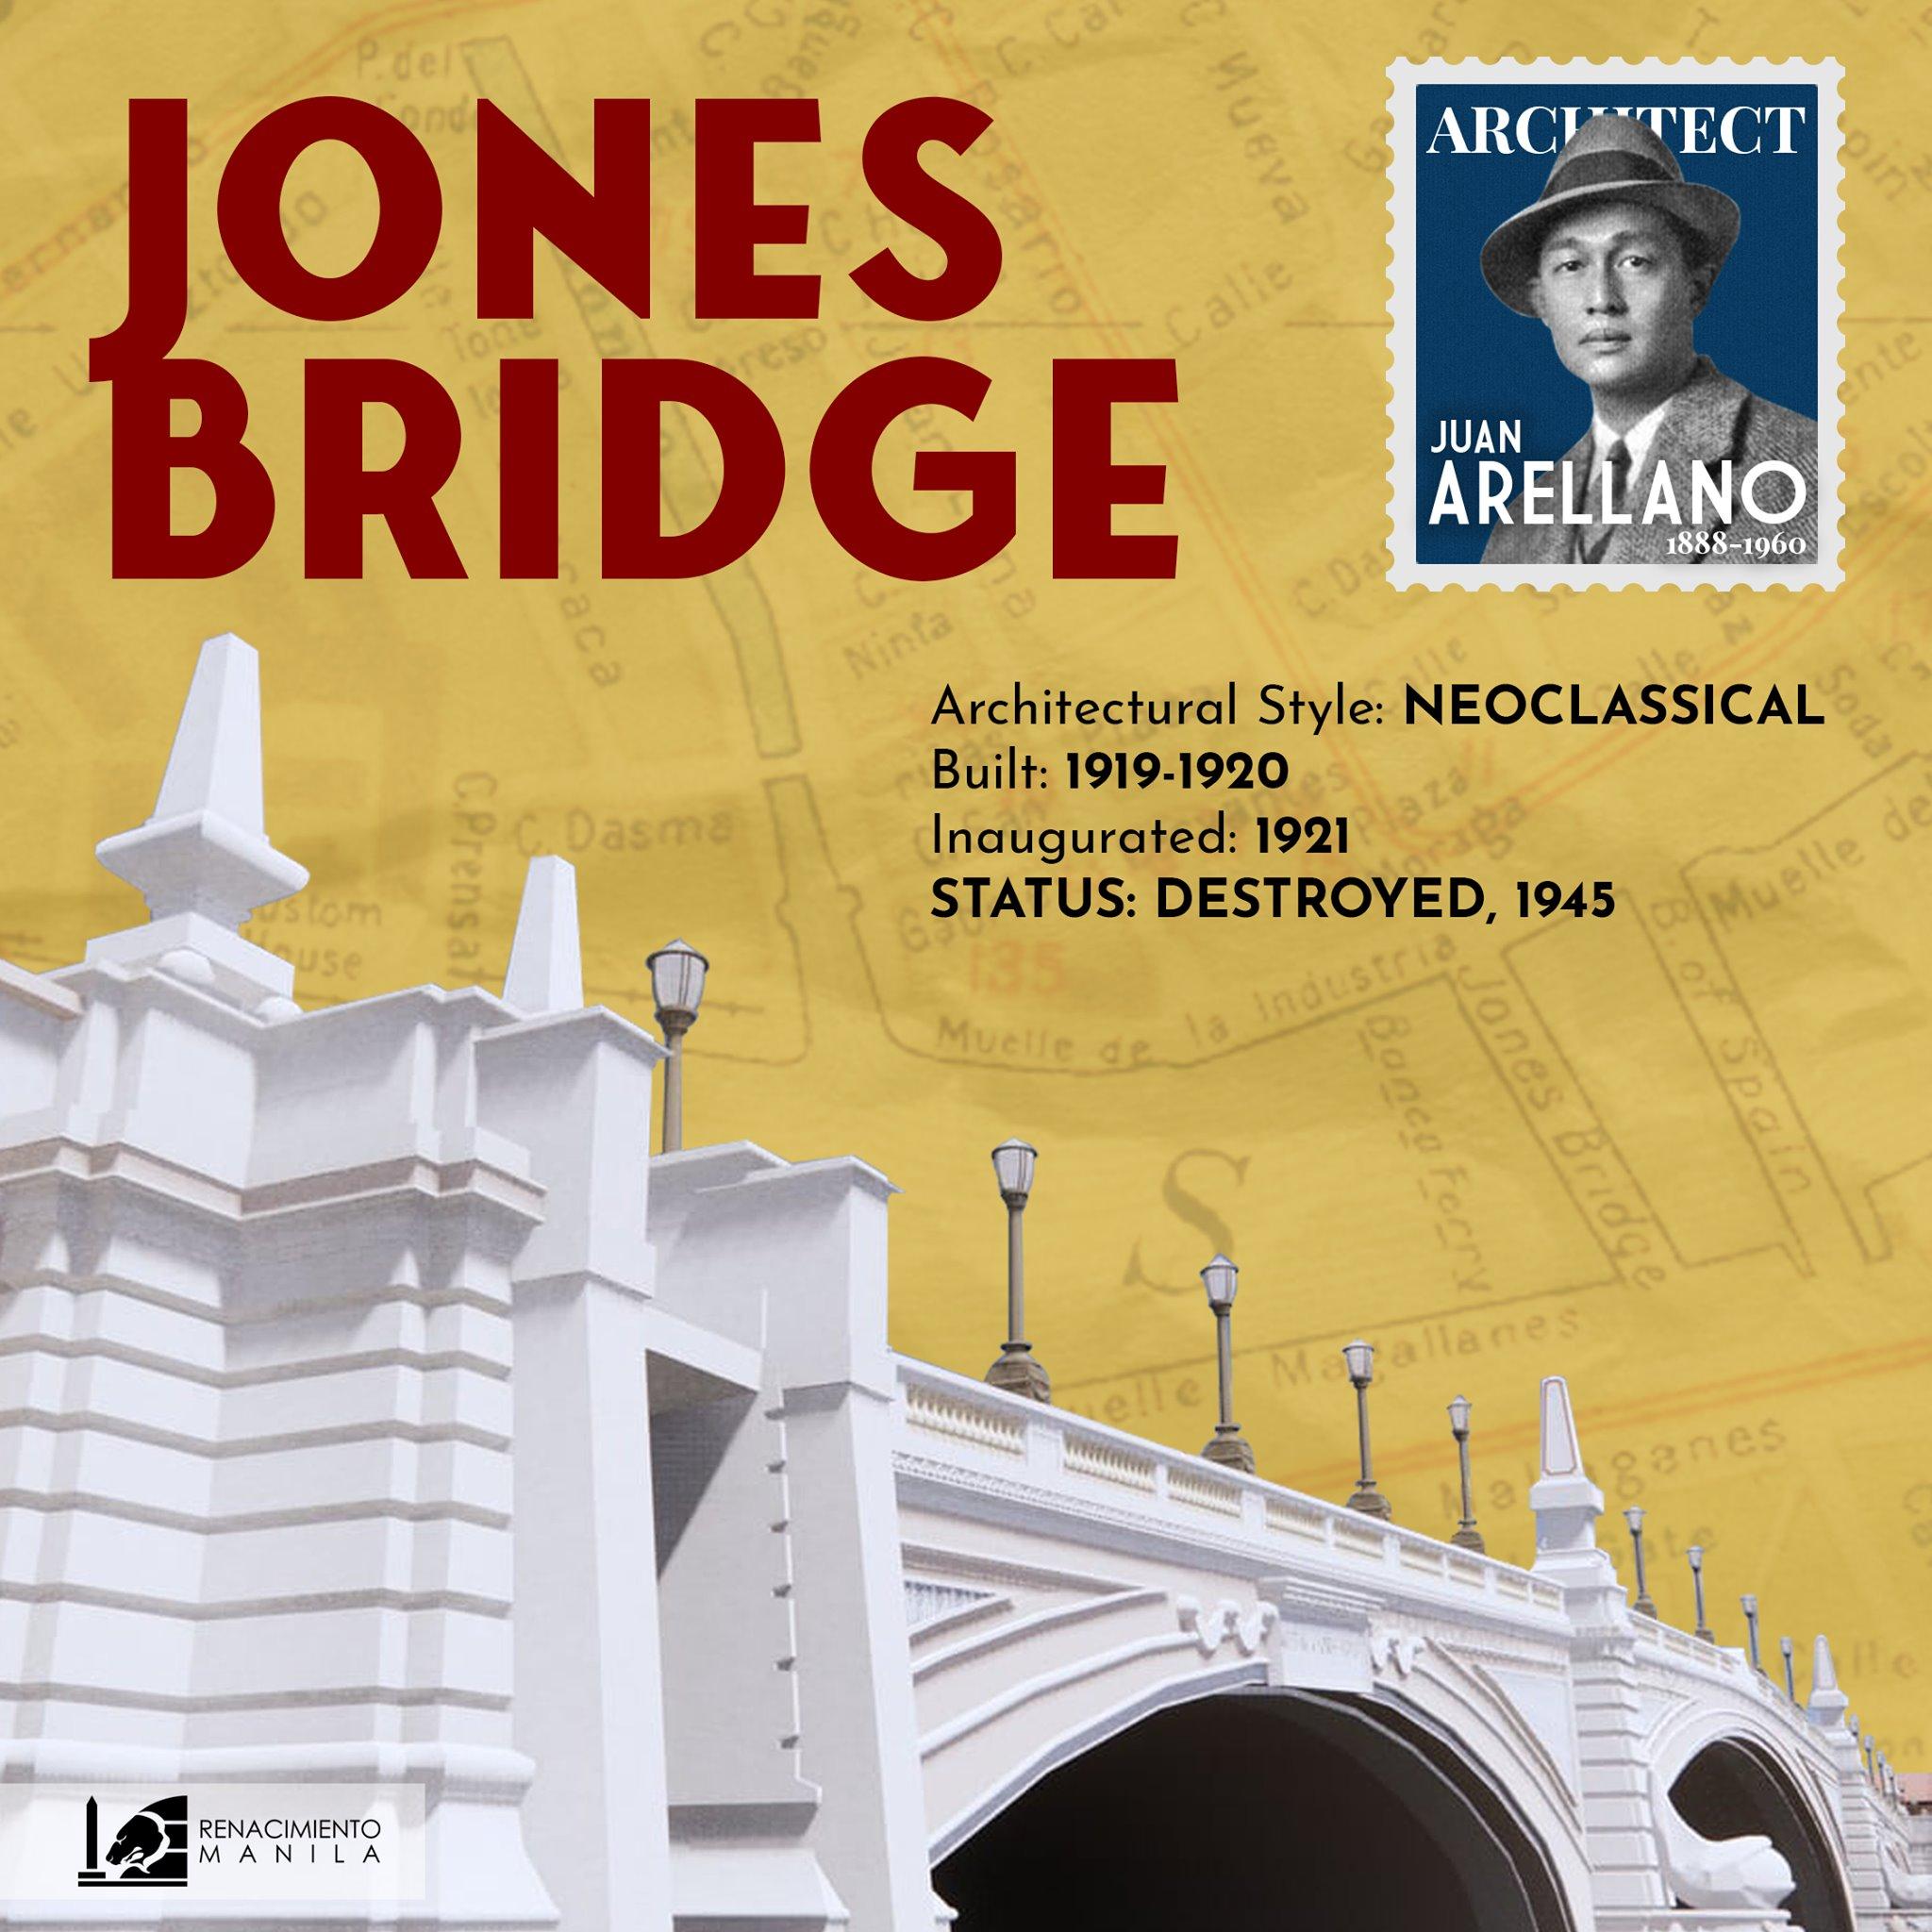 Jones Bridge - Juan Arellano (1888-1960)